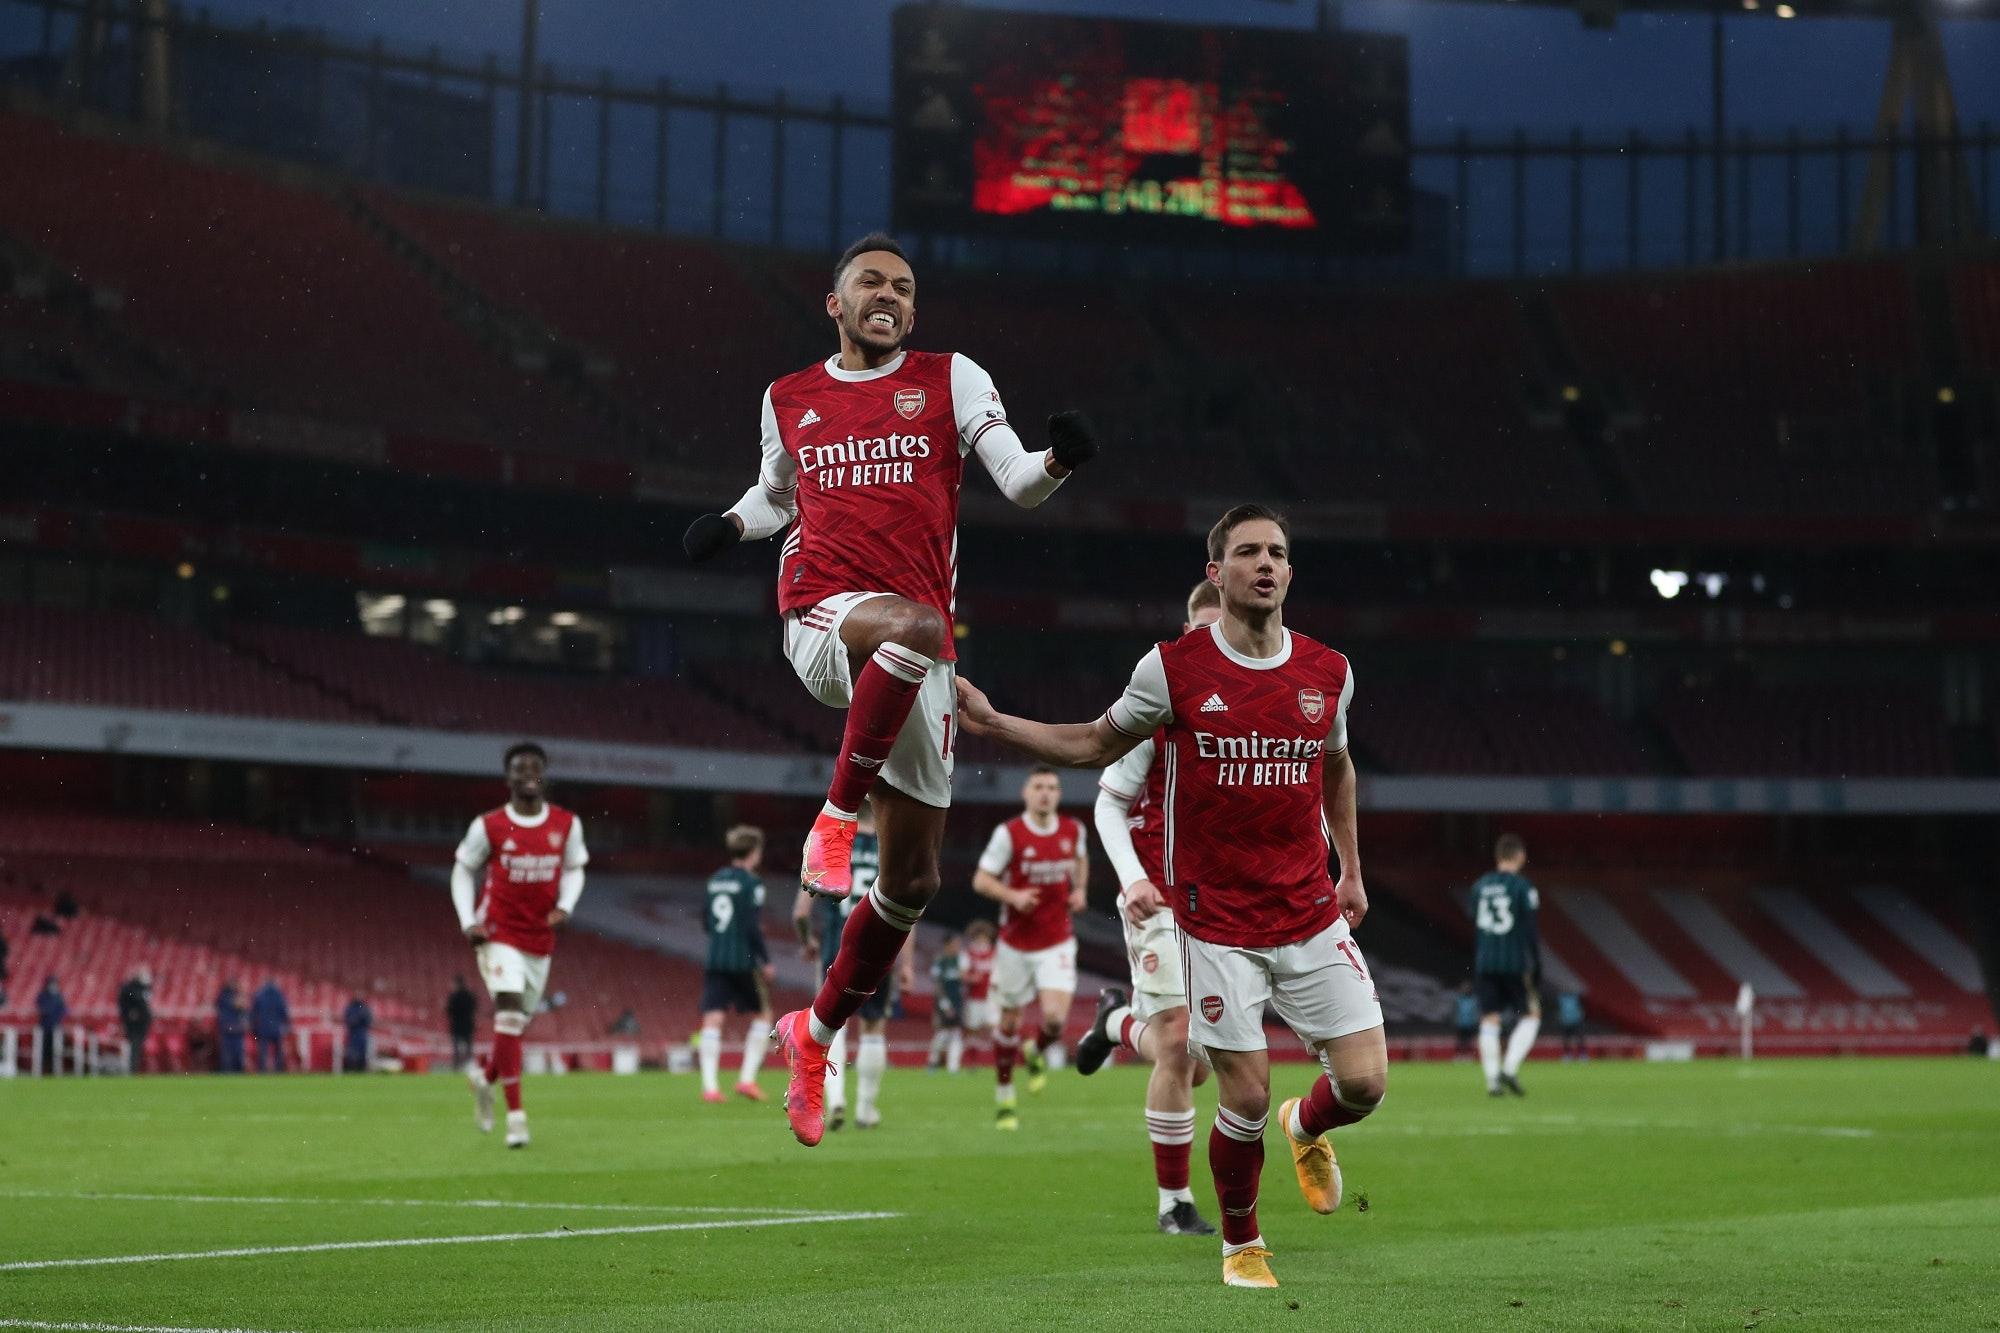 Arsenal v Leeds United - Pierre-Emerick Aubameyang